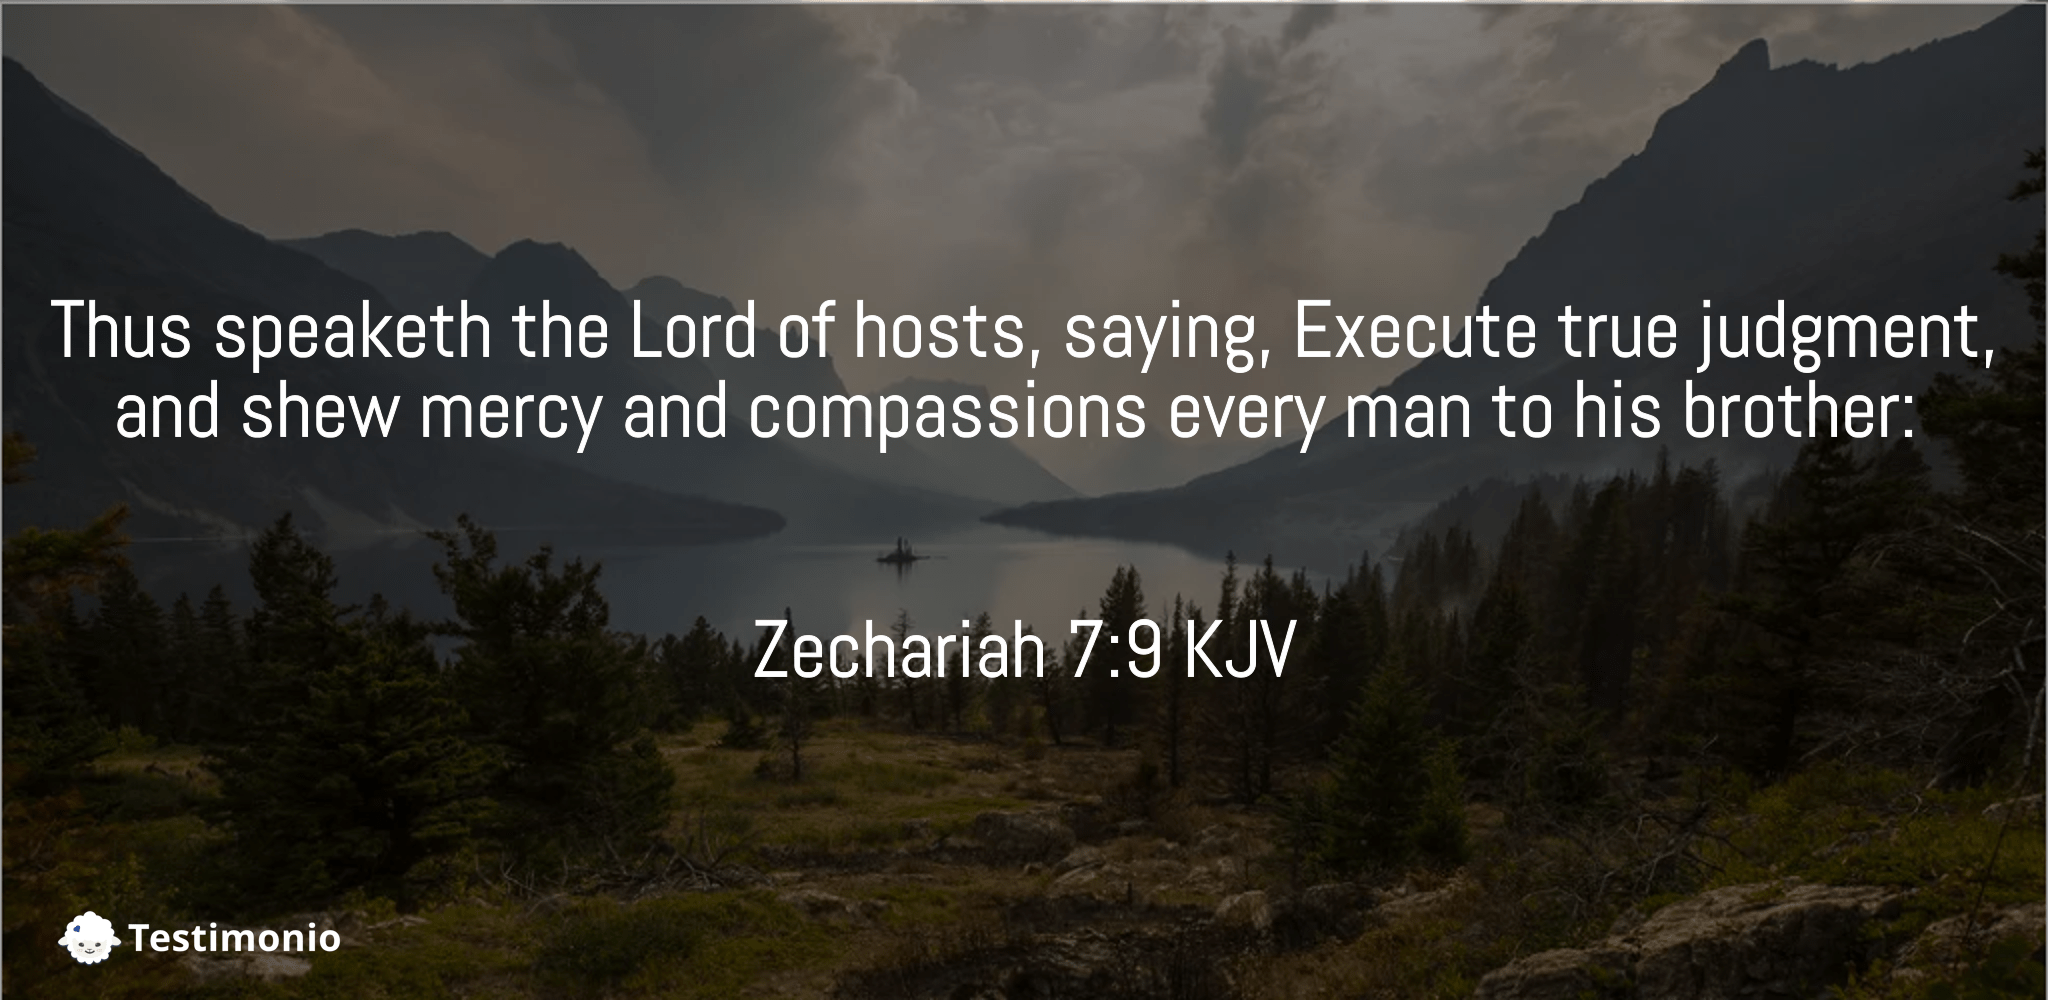 Zechariah 7:9